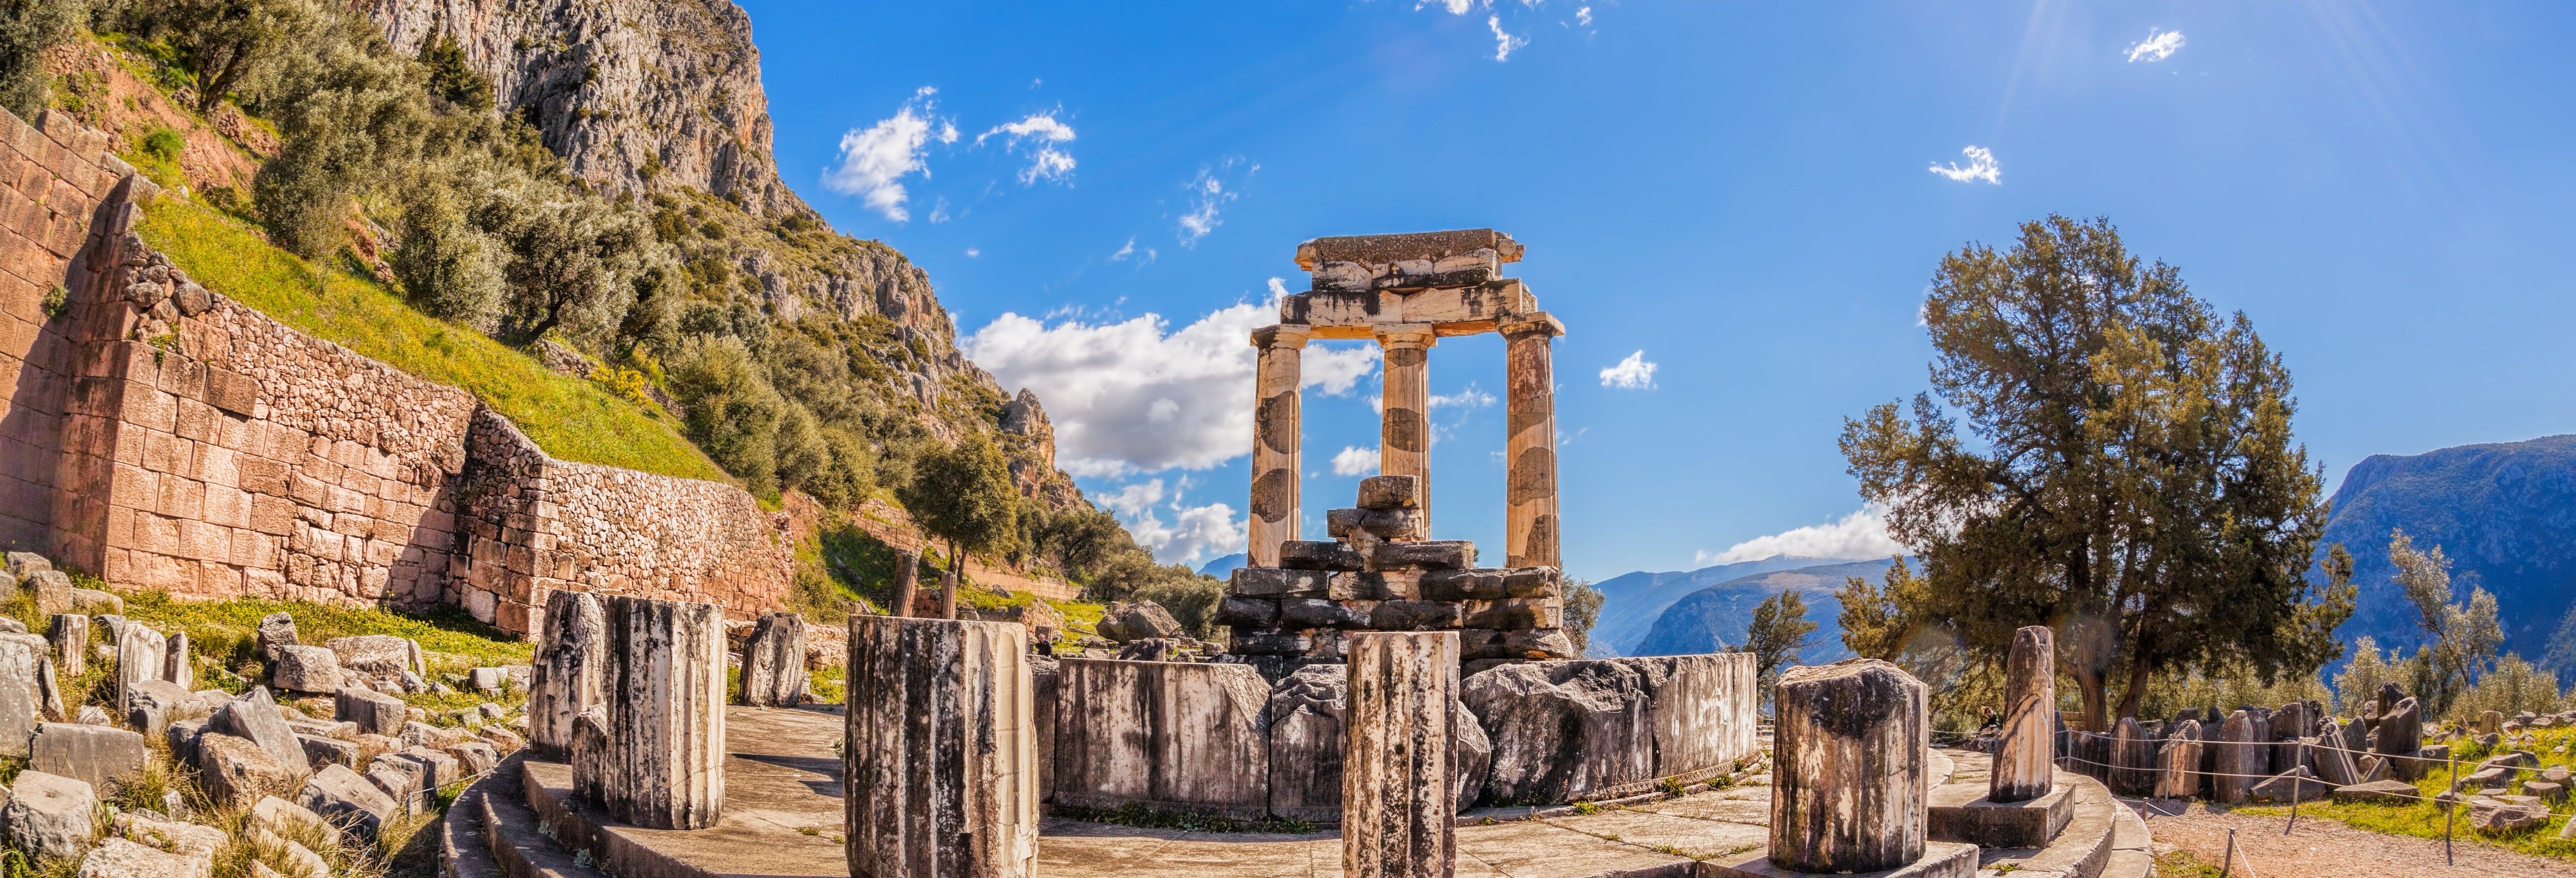 Excursión a Delfos